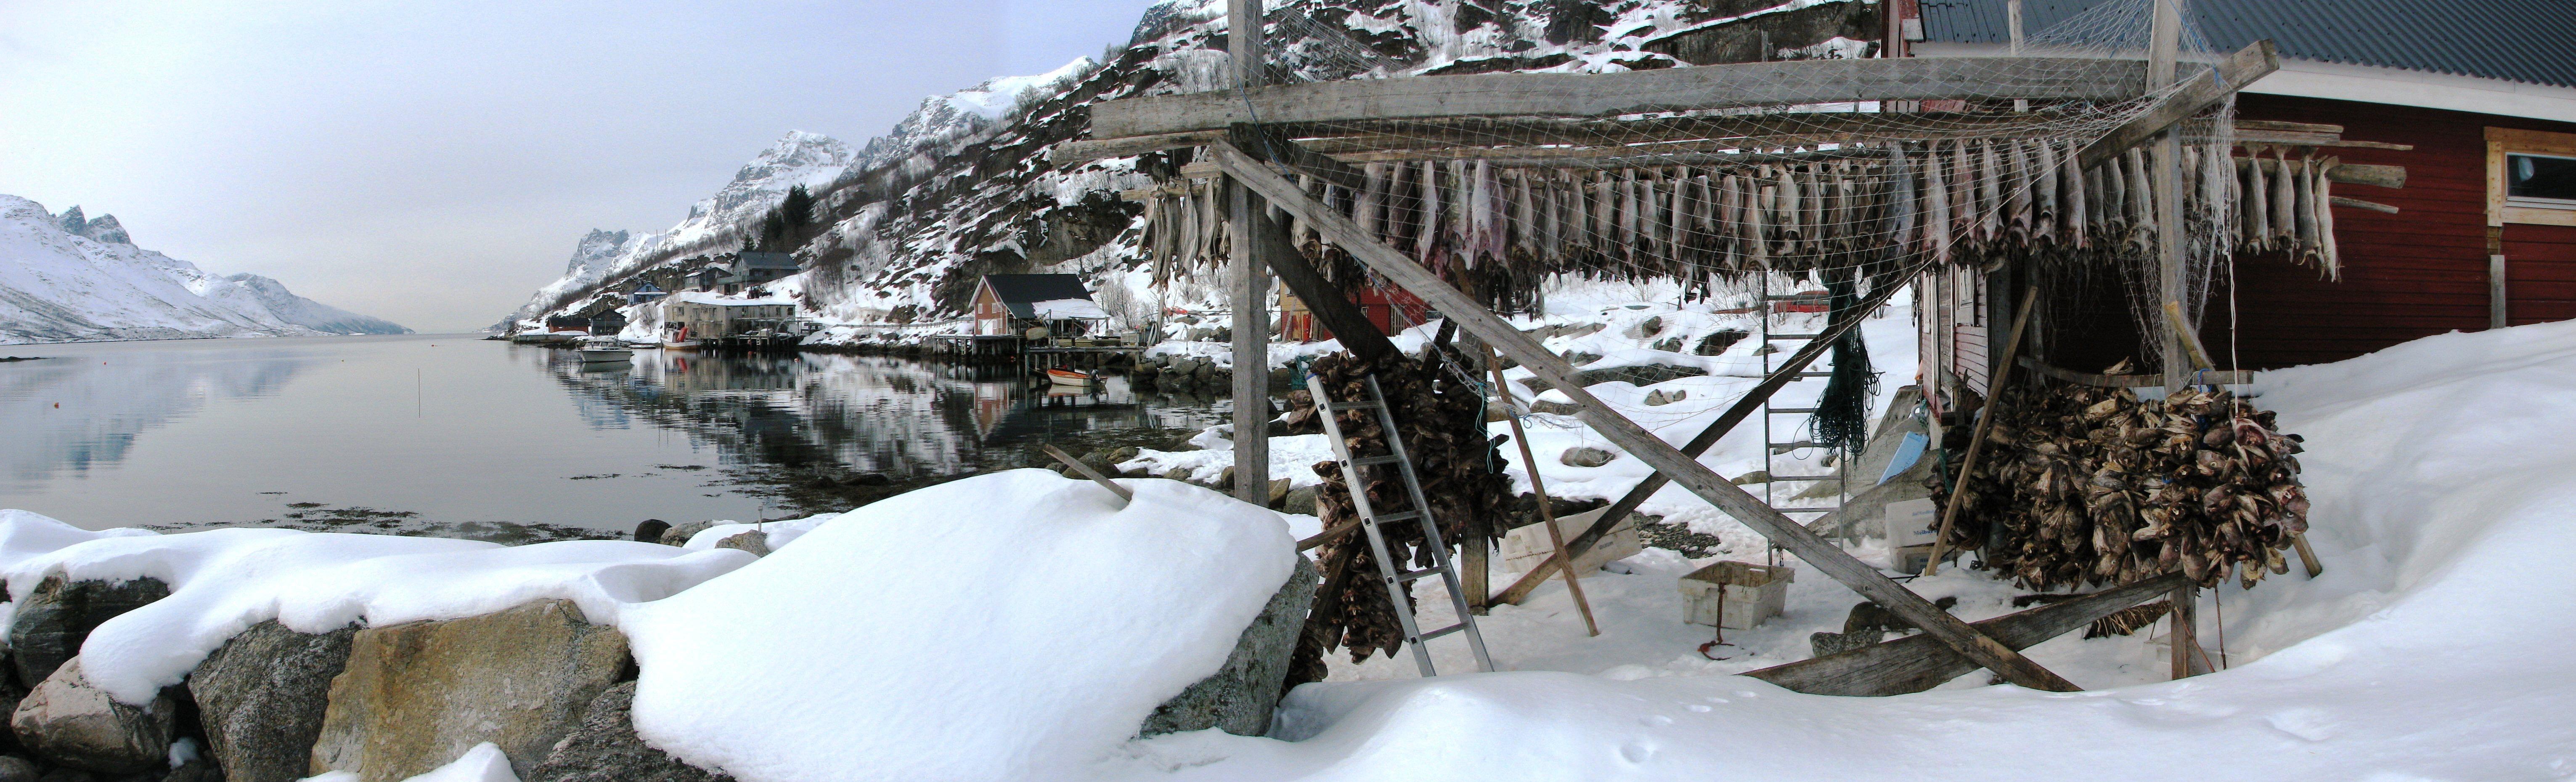 Ersfjord06.jpg